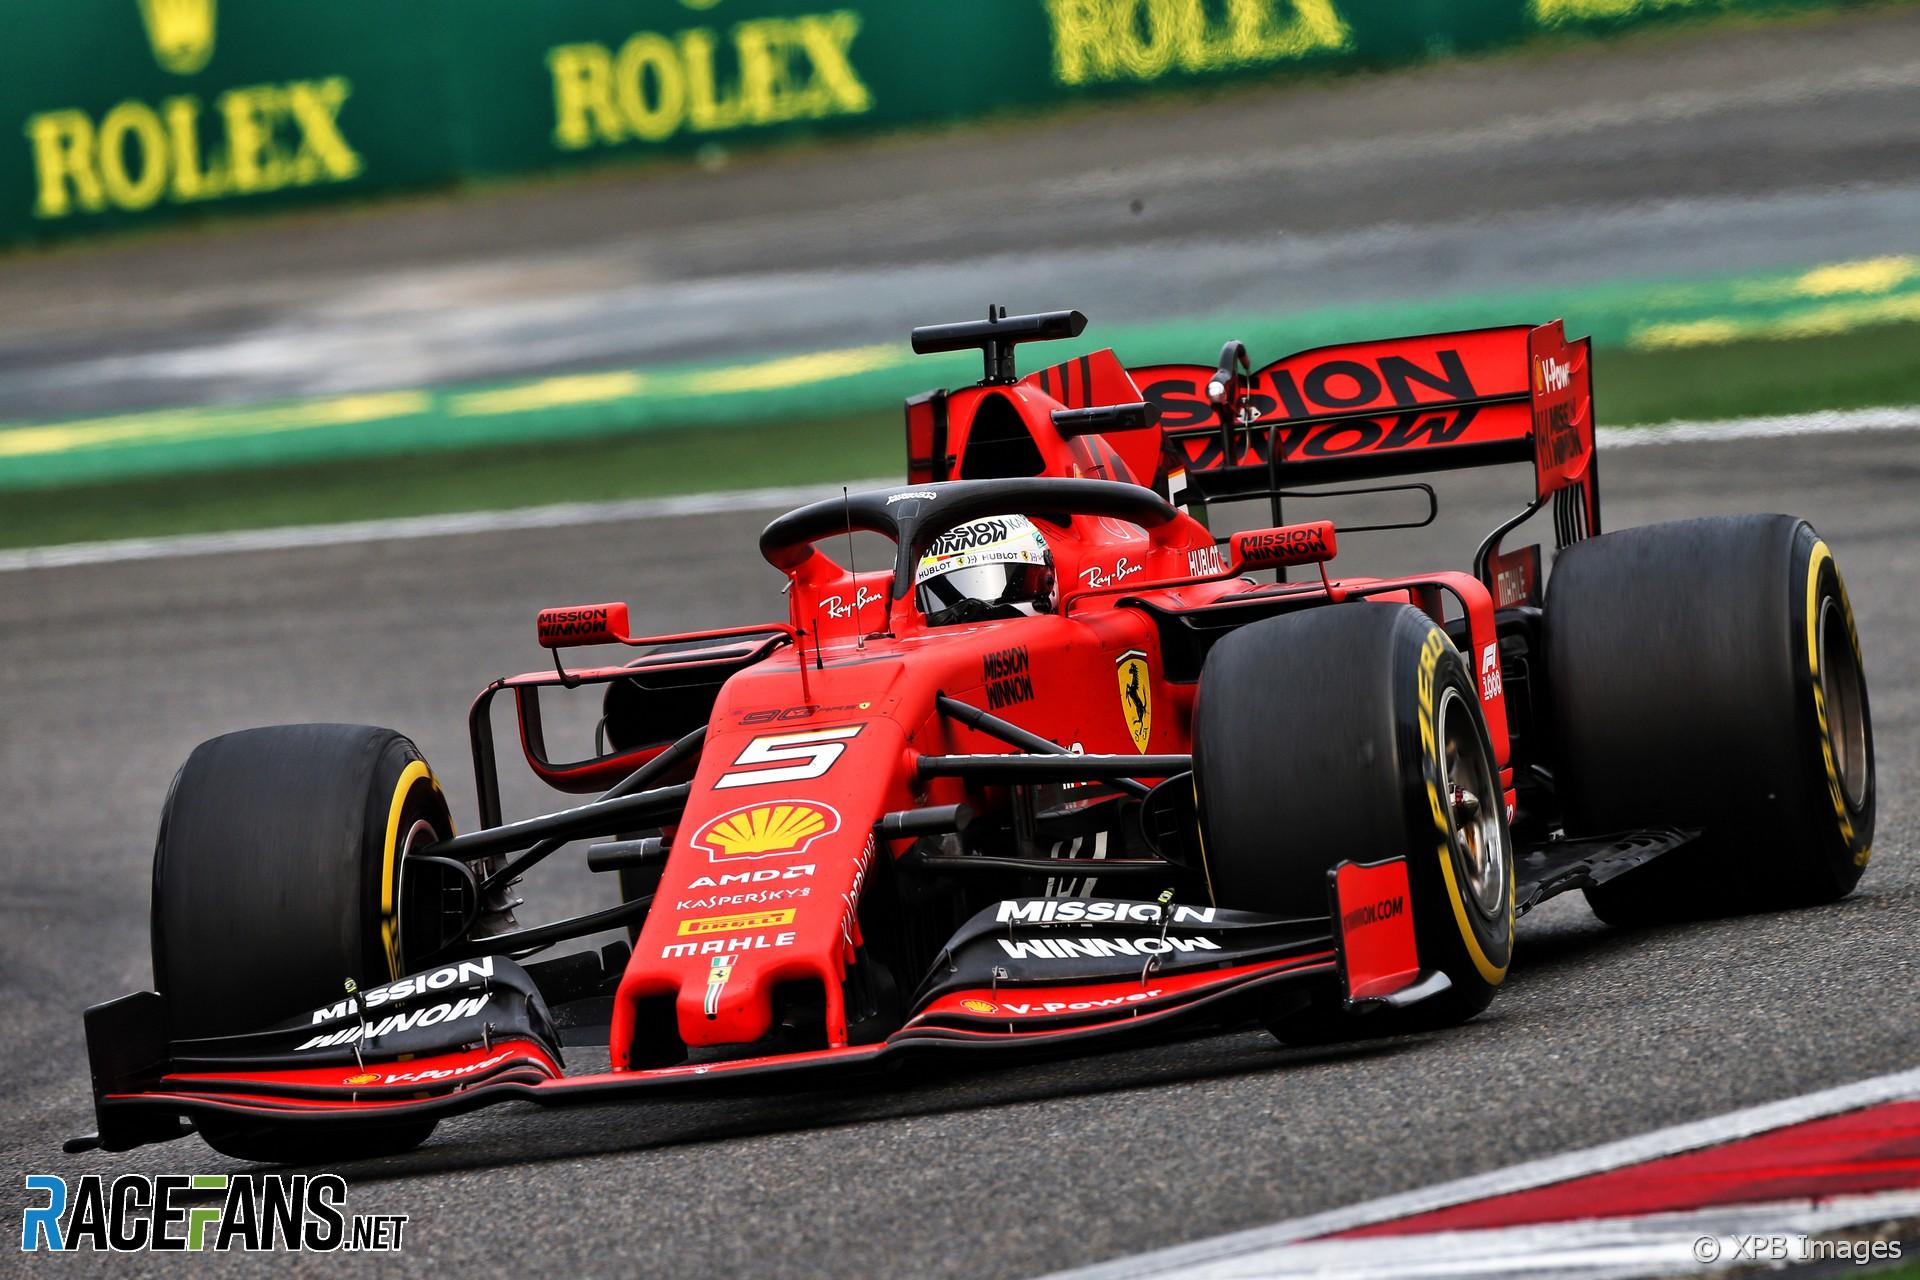 Ferrari F1 Team Doubt Baku Speed Advantage Over Mercedes Racefans